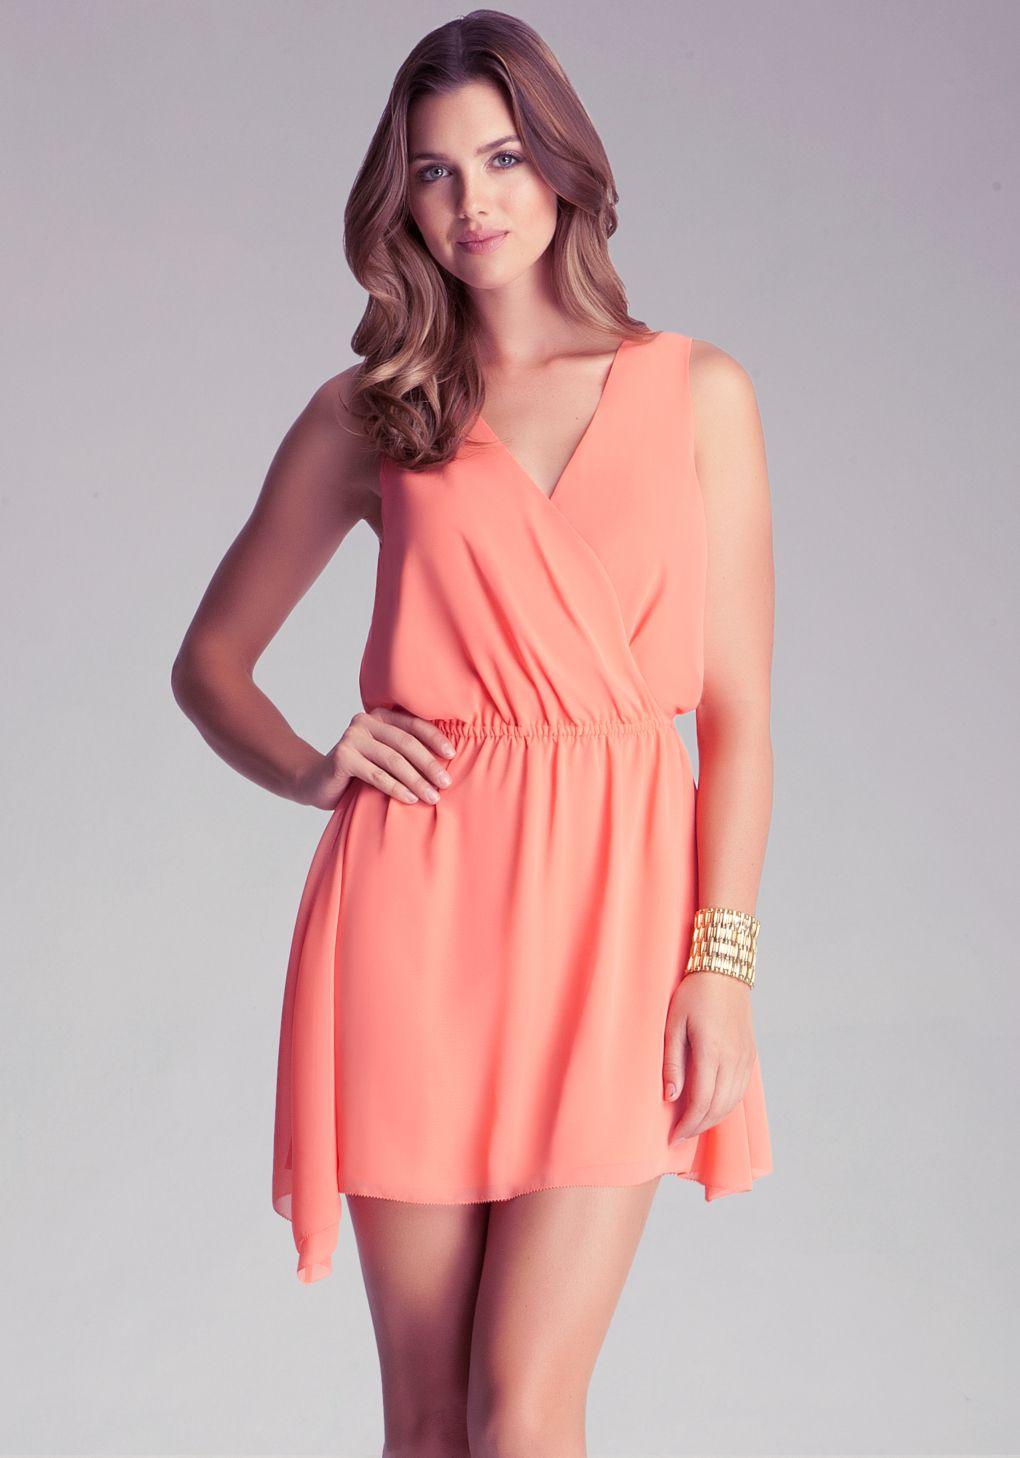 ea7606ae721 Bebe Surplice Chiffon Dress in Orange